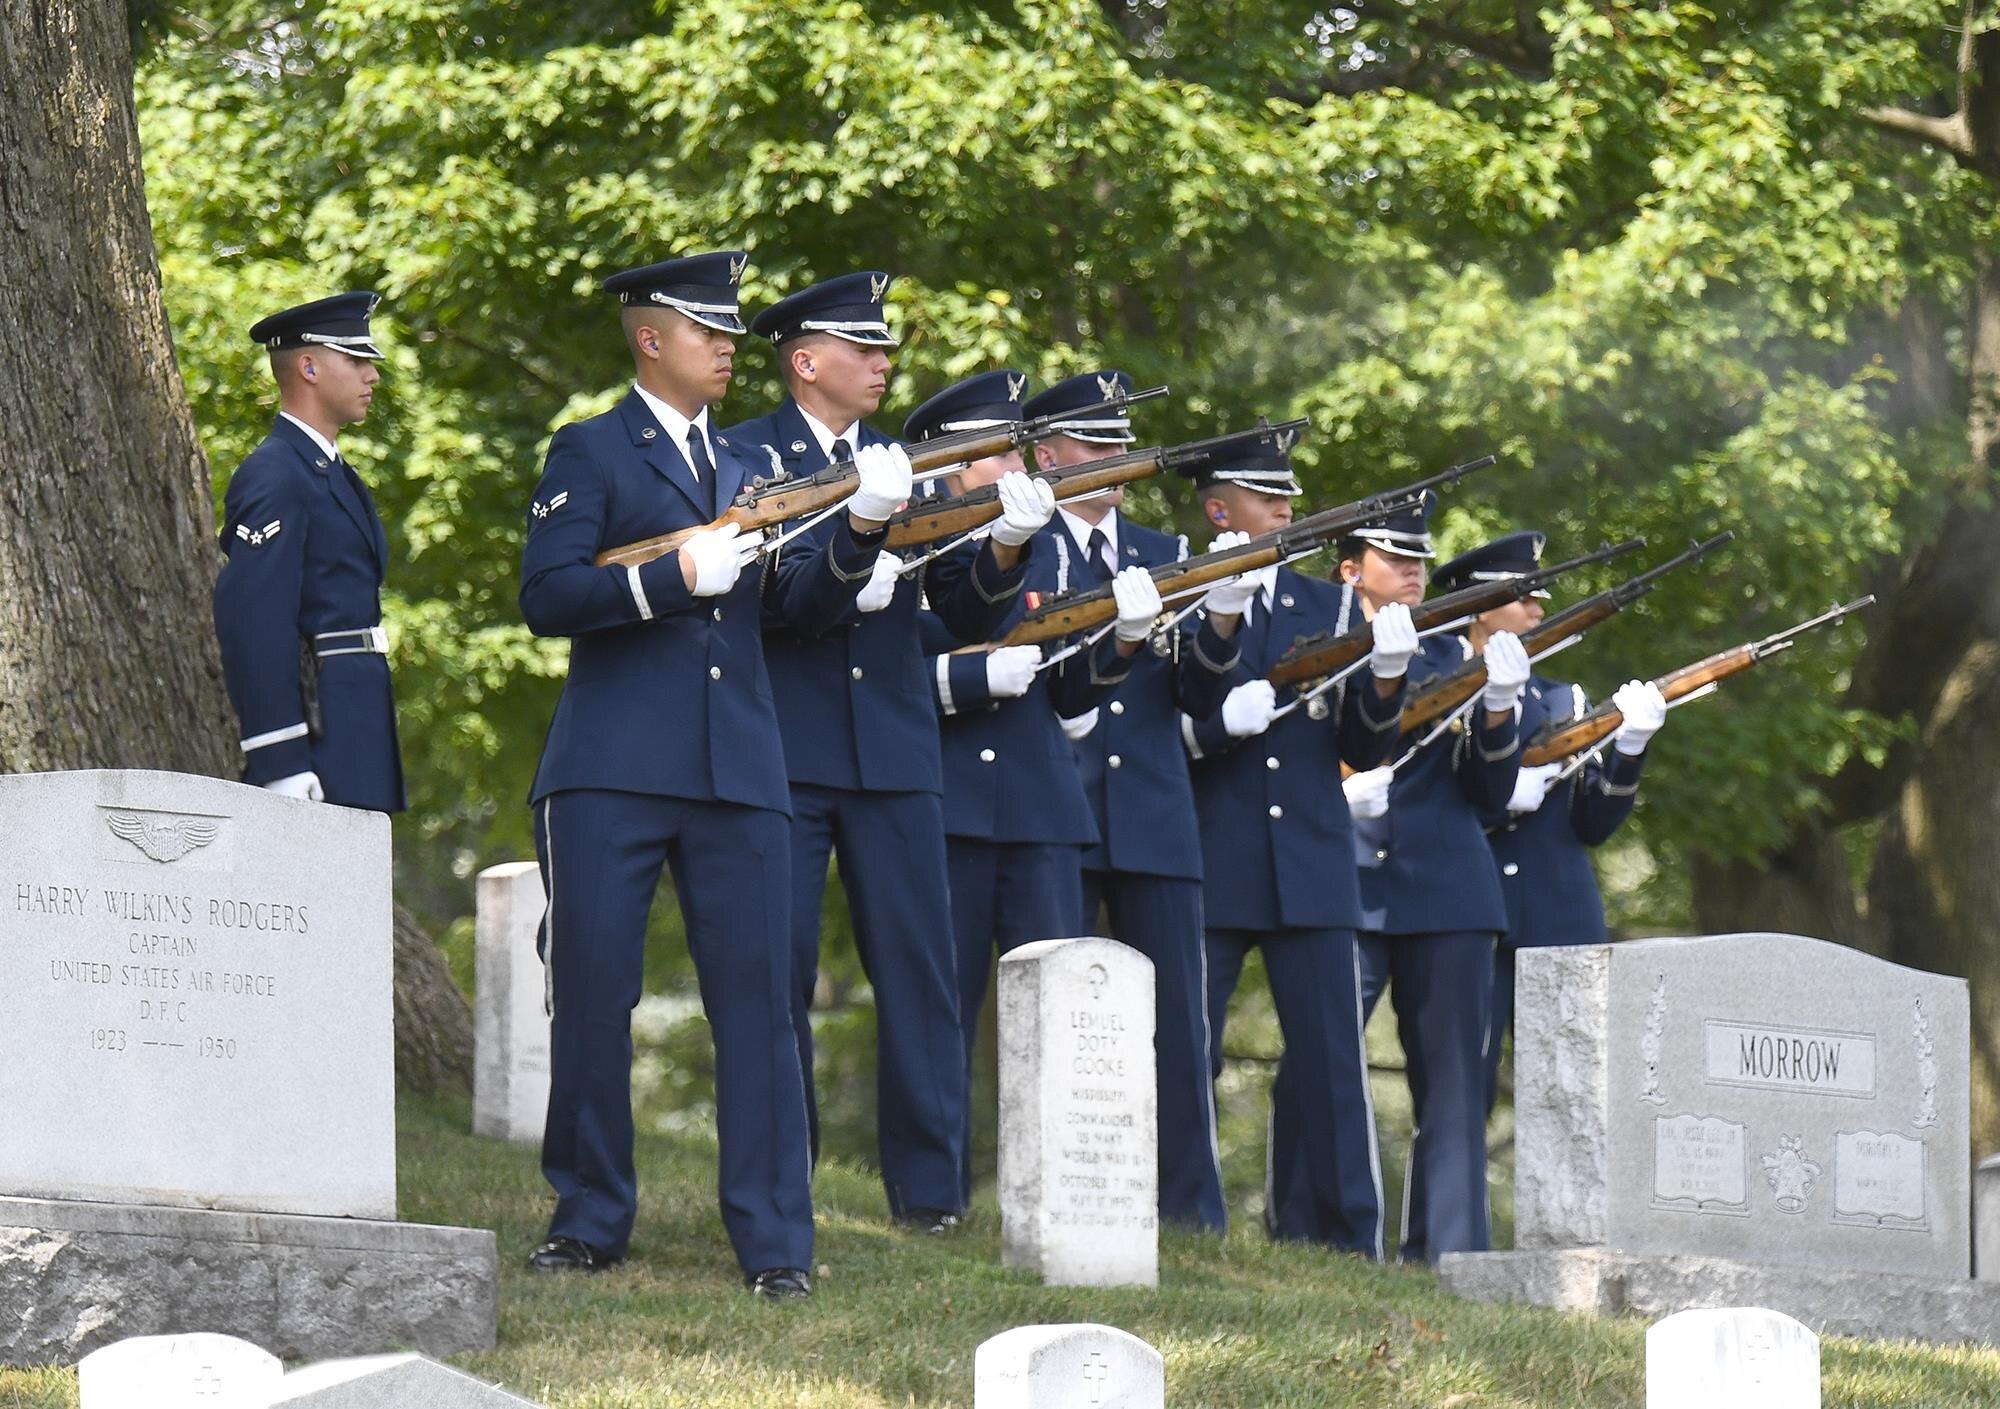 Service members render full honors for retired Col. Freeman Bruce Olmstead's funeral at Arlington National Cemetery, Arlington, Va. July 27, 2017. Olmstead, an Air Force veteran and prisoner of war survivor, passed away Oct. 14, 2017.  (US Air Force Photo/Andy Morataya)